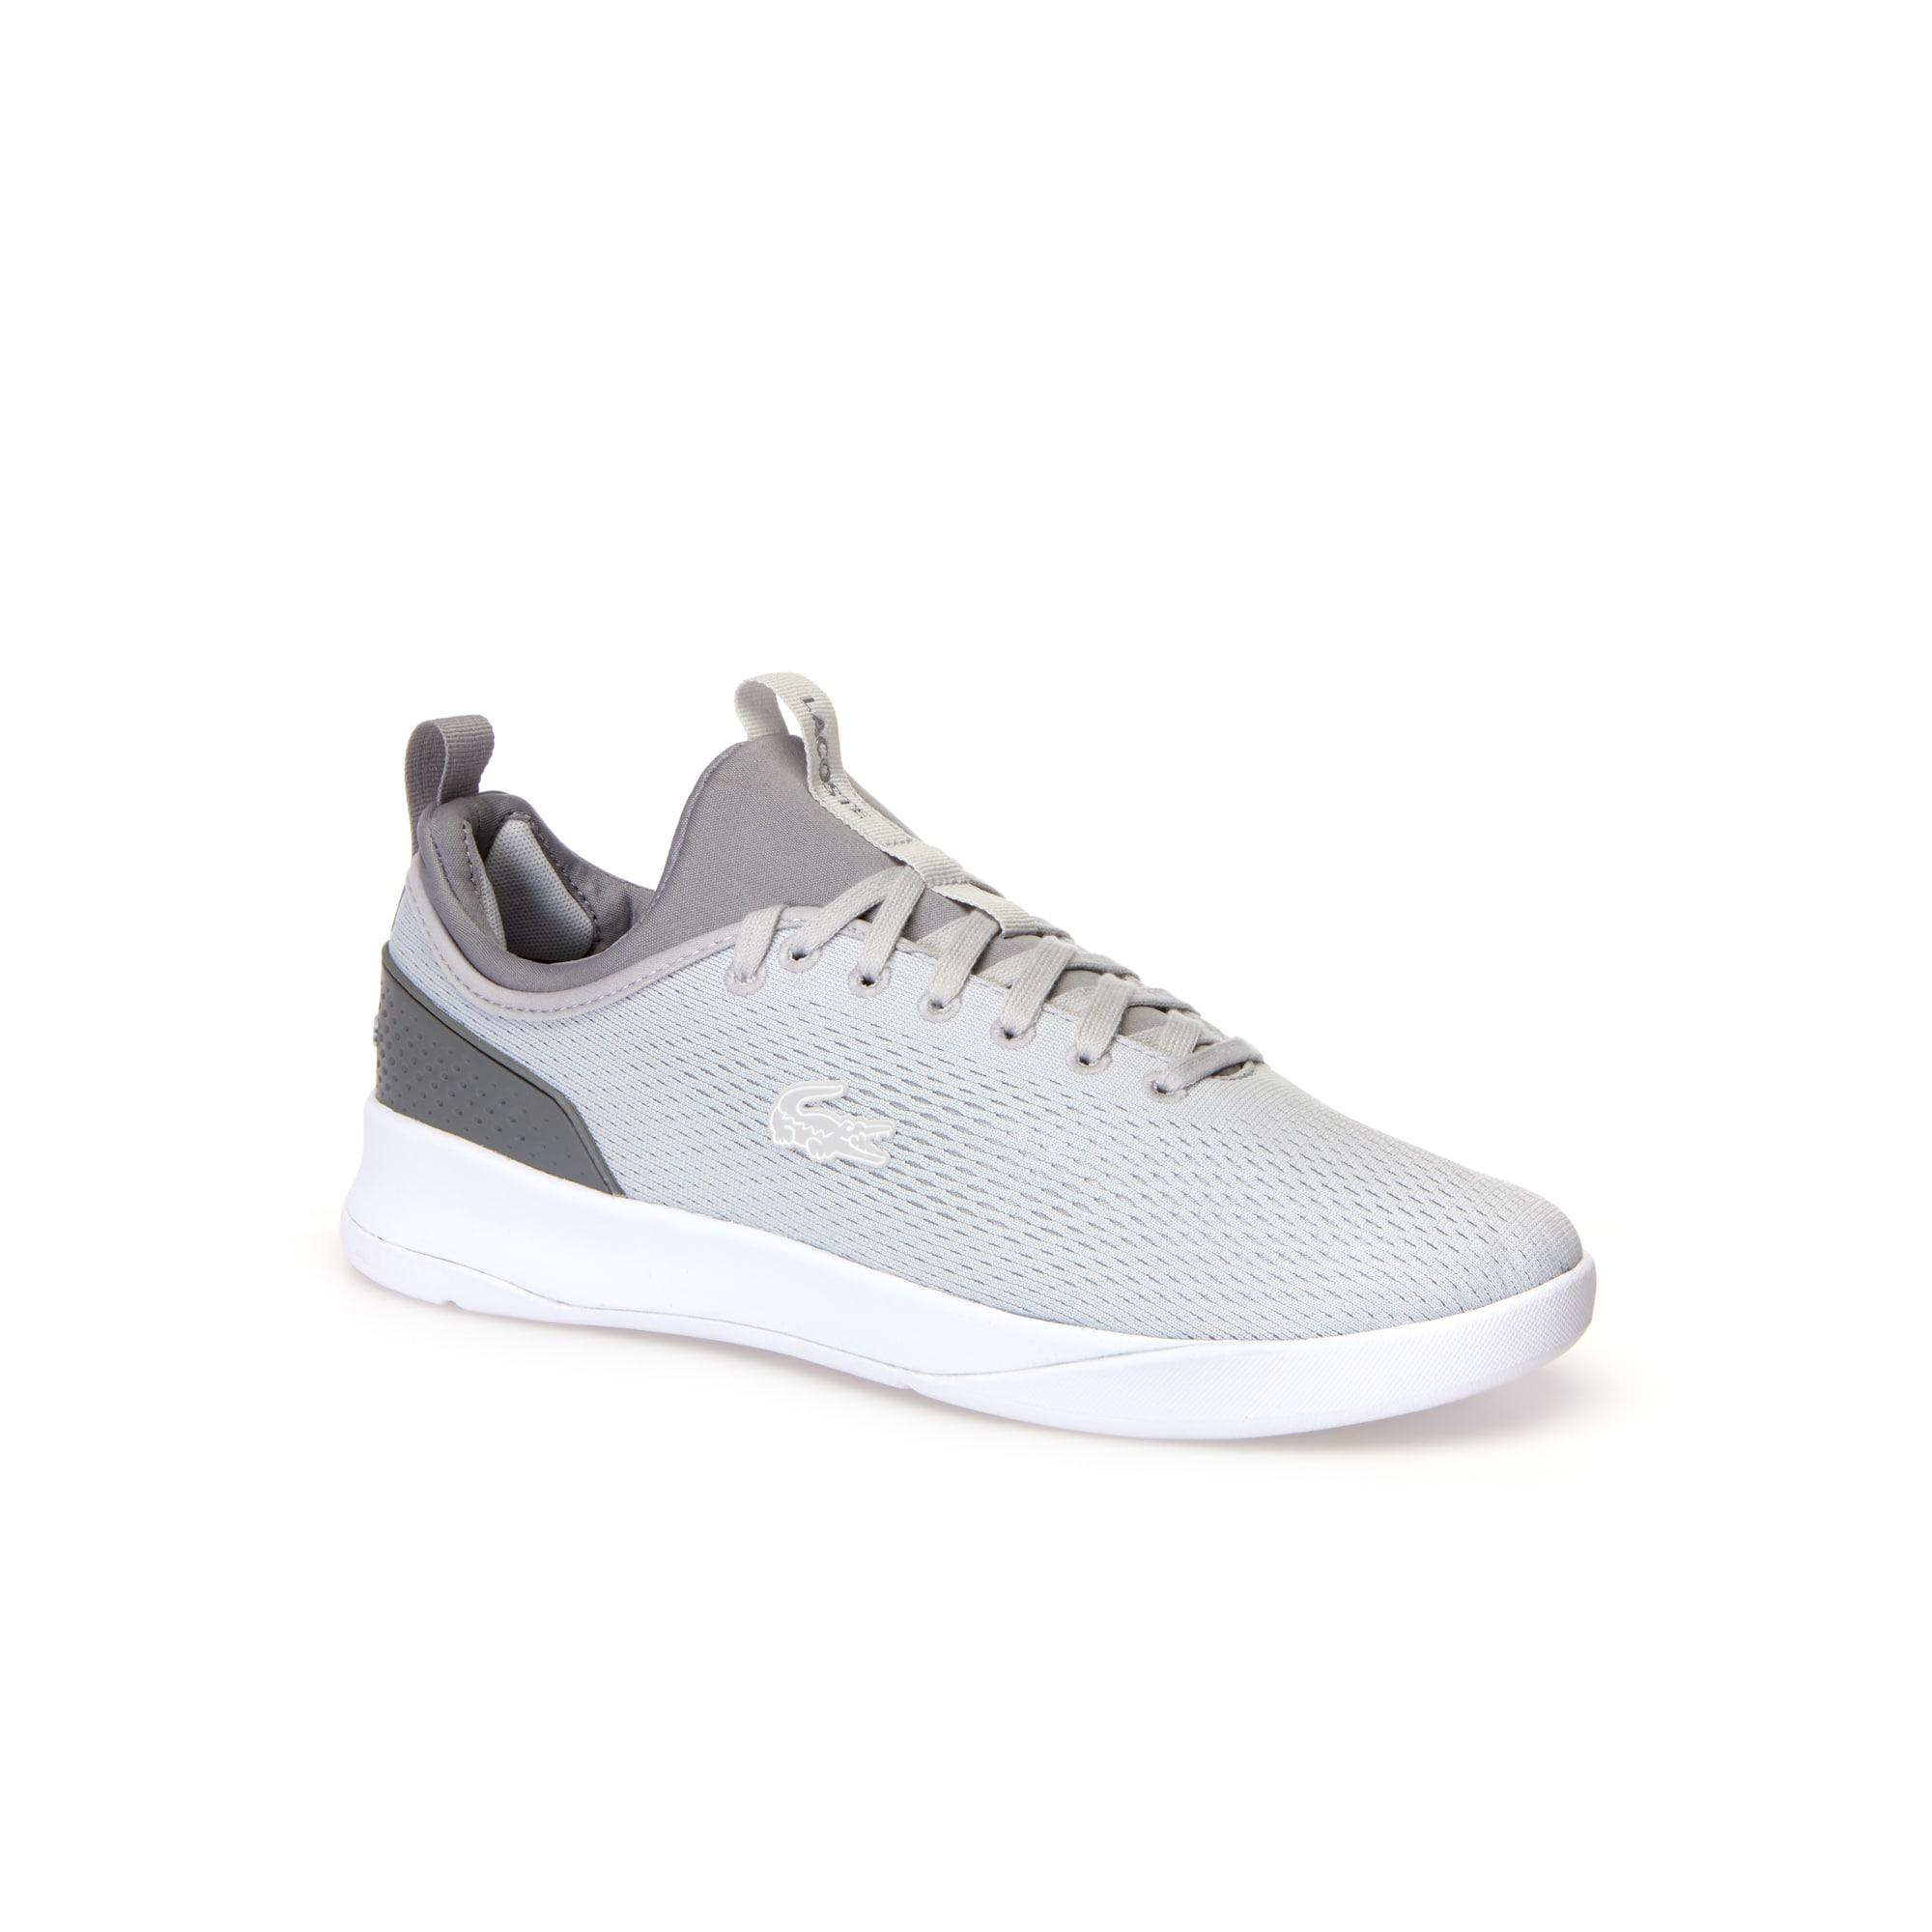 Schuhe Schuhe Für Herren HerrenschuheLacoste HerrenschuheLacoste Herren Für nN0wm8